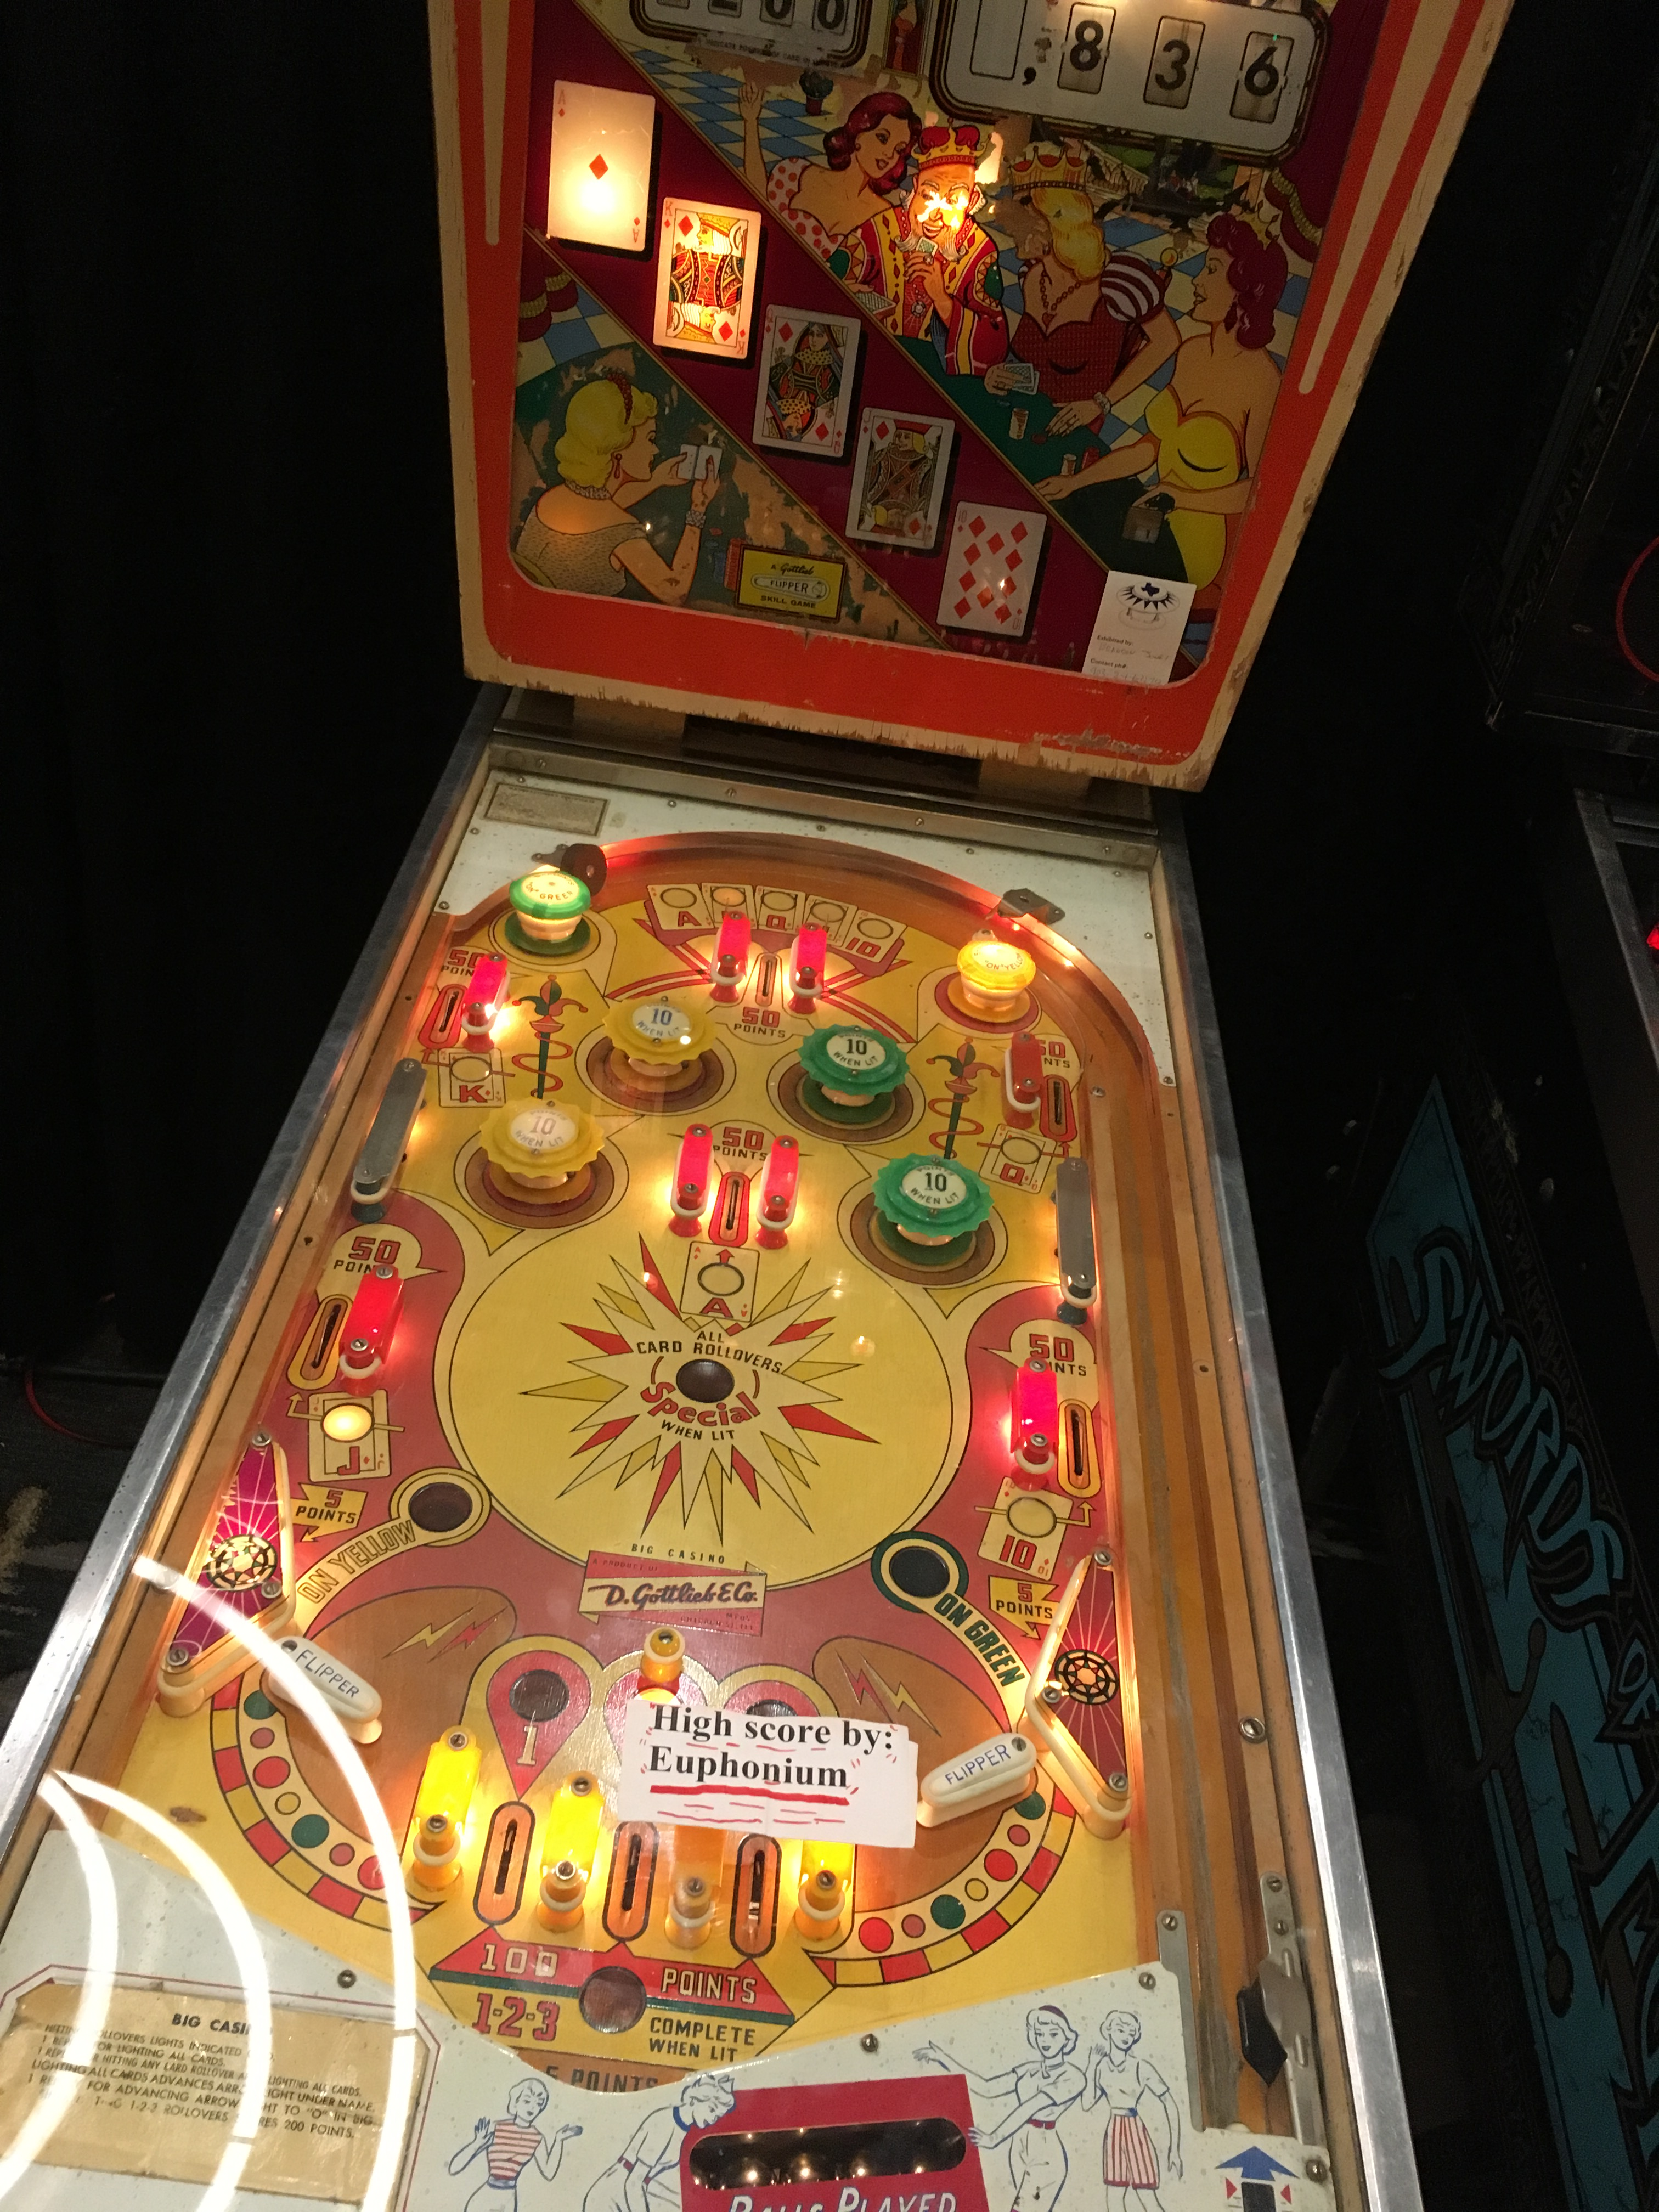 euphonium: Big Casino (Pinball: 5 Balls) 836 points on 2018-03-18 21:21:15